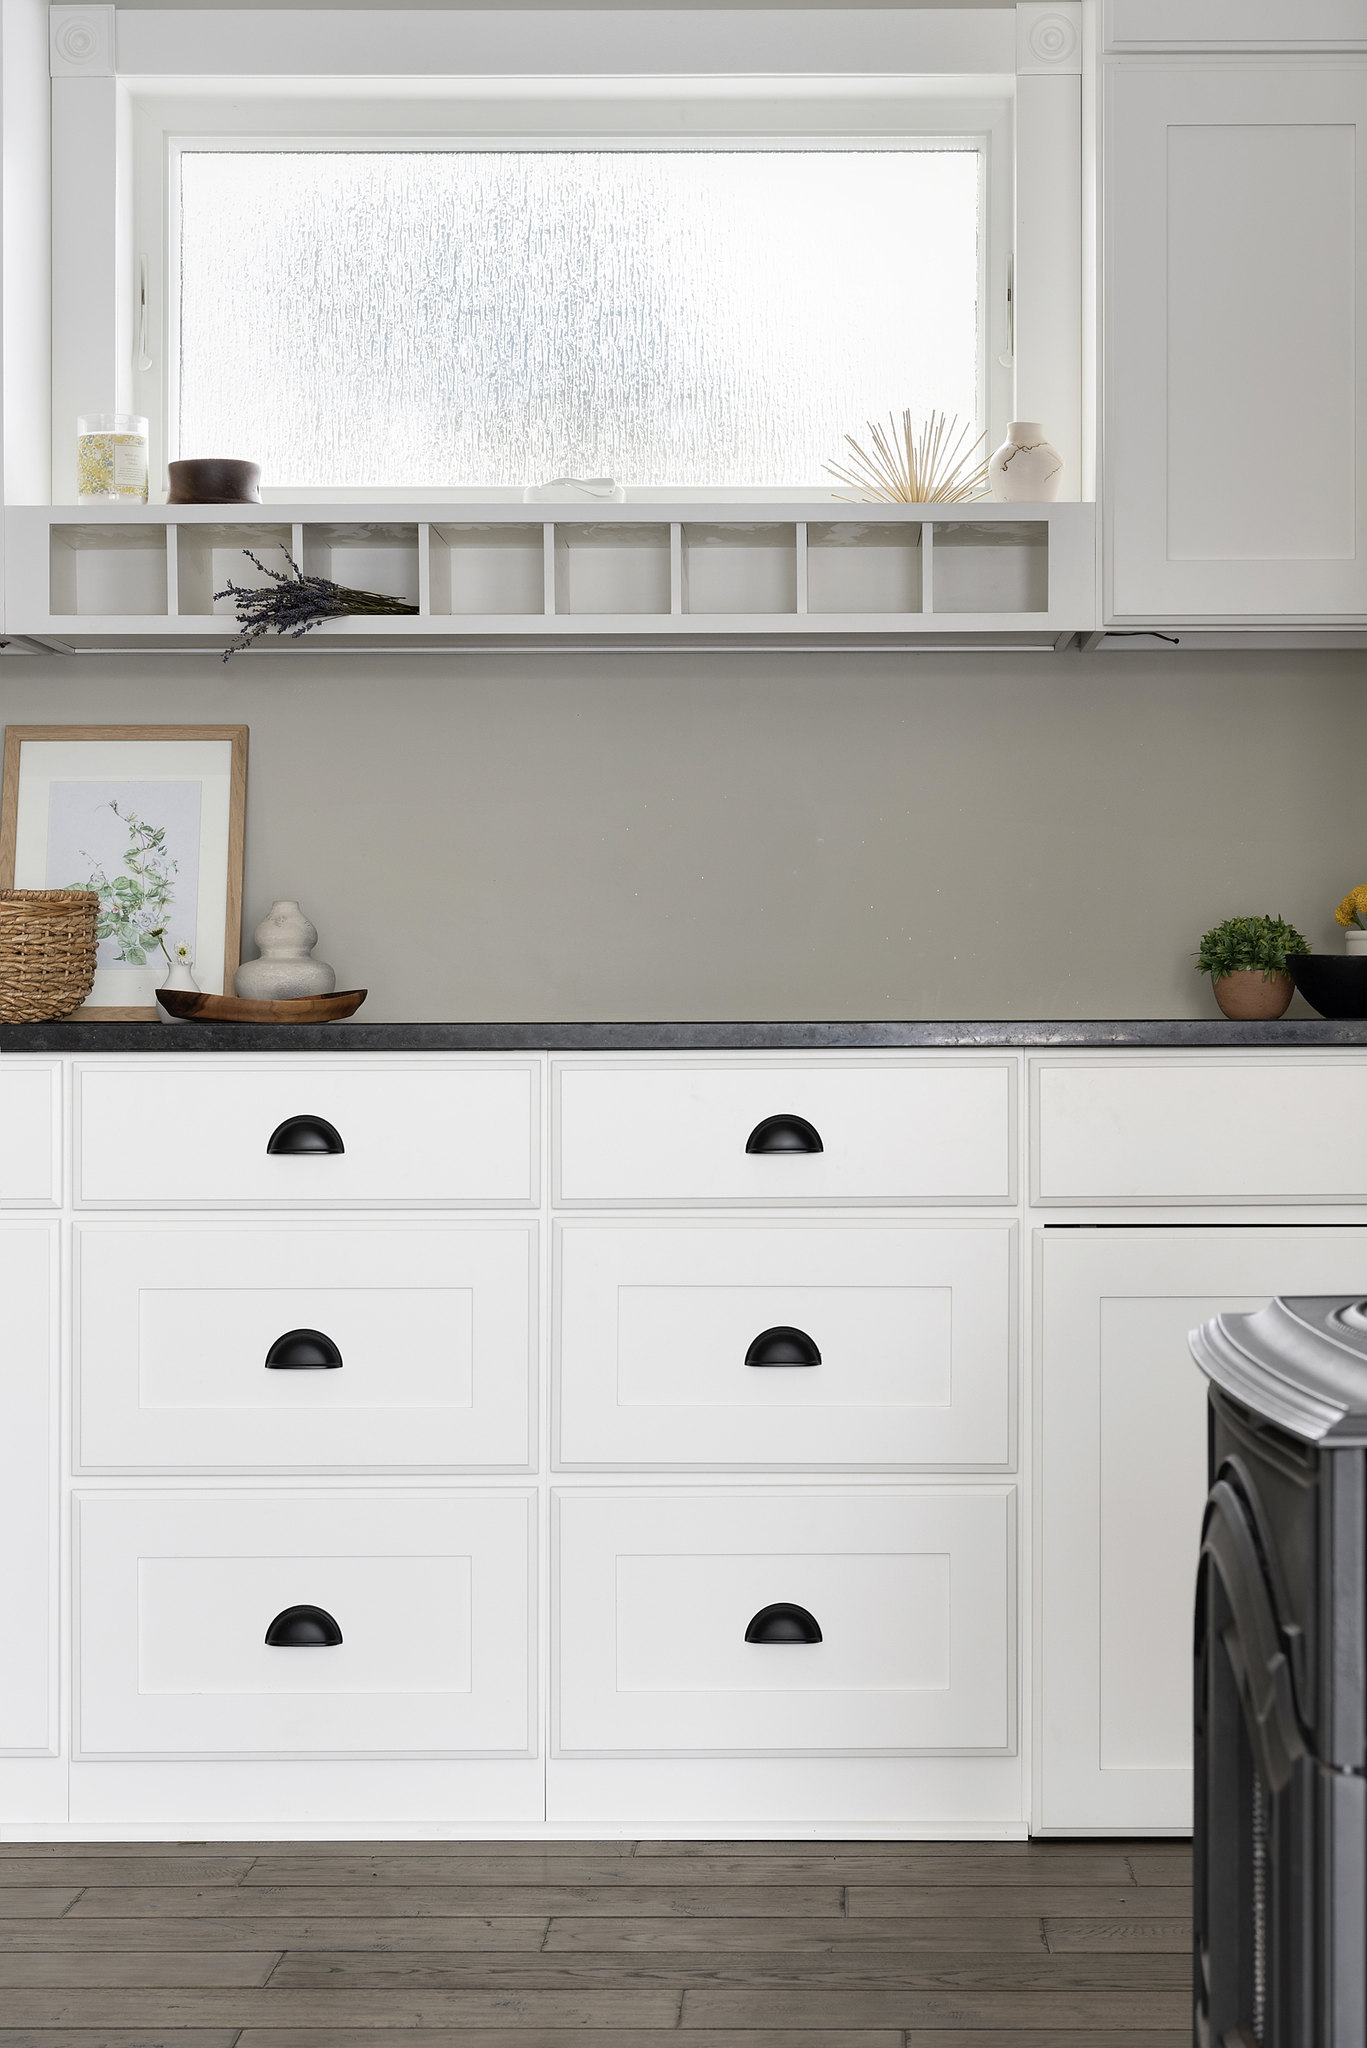 Kitchen remodel by White Birch Design, A Lakeville MN based remodeler